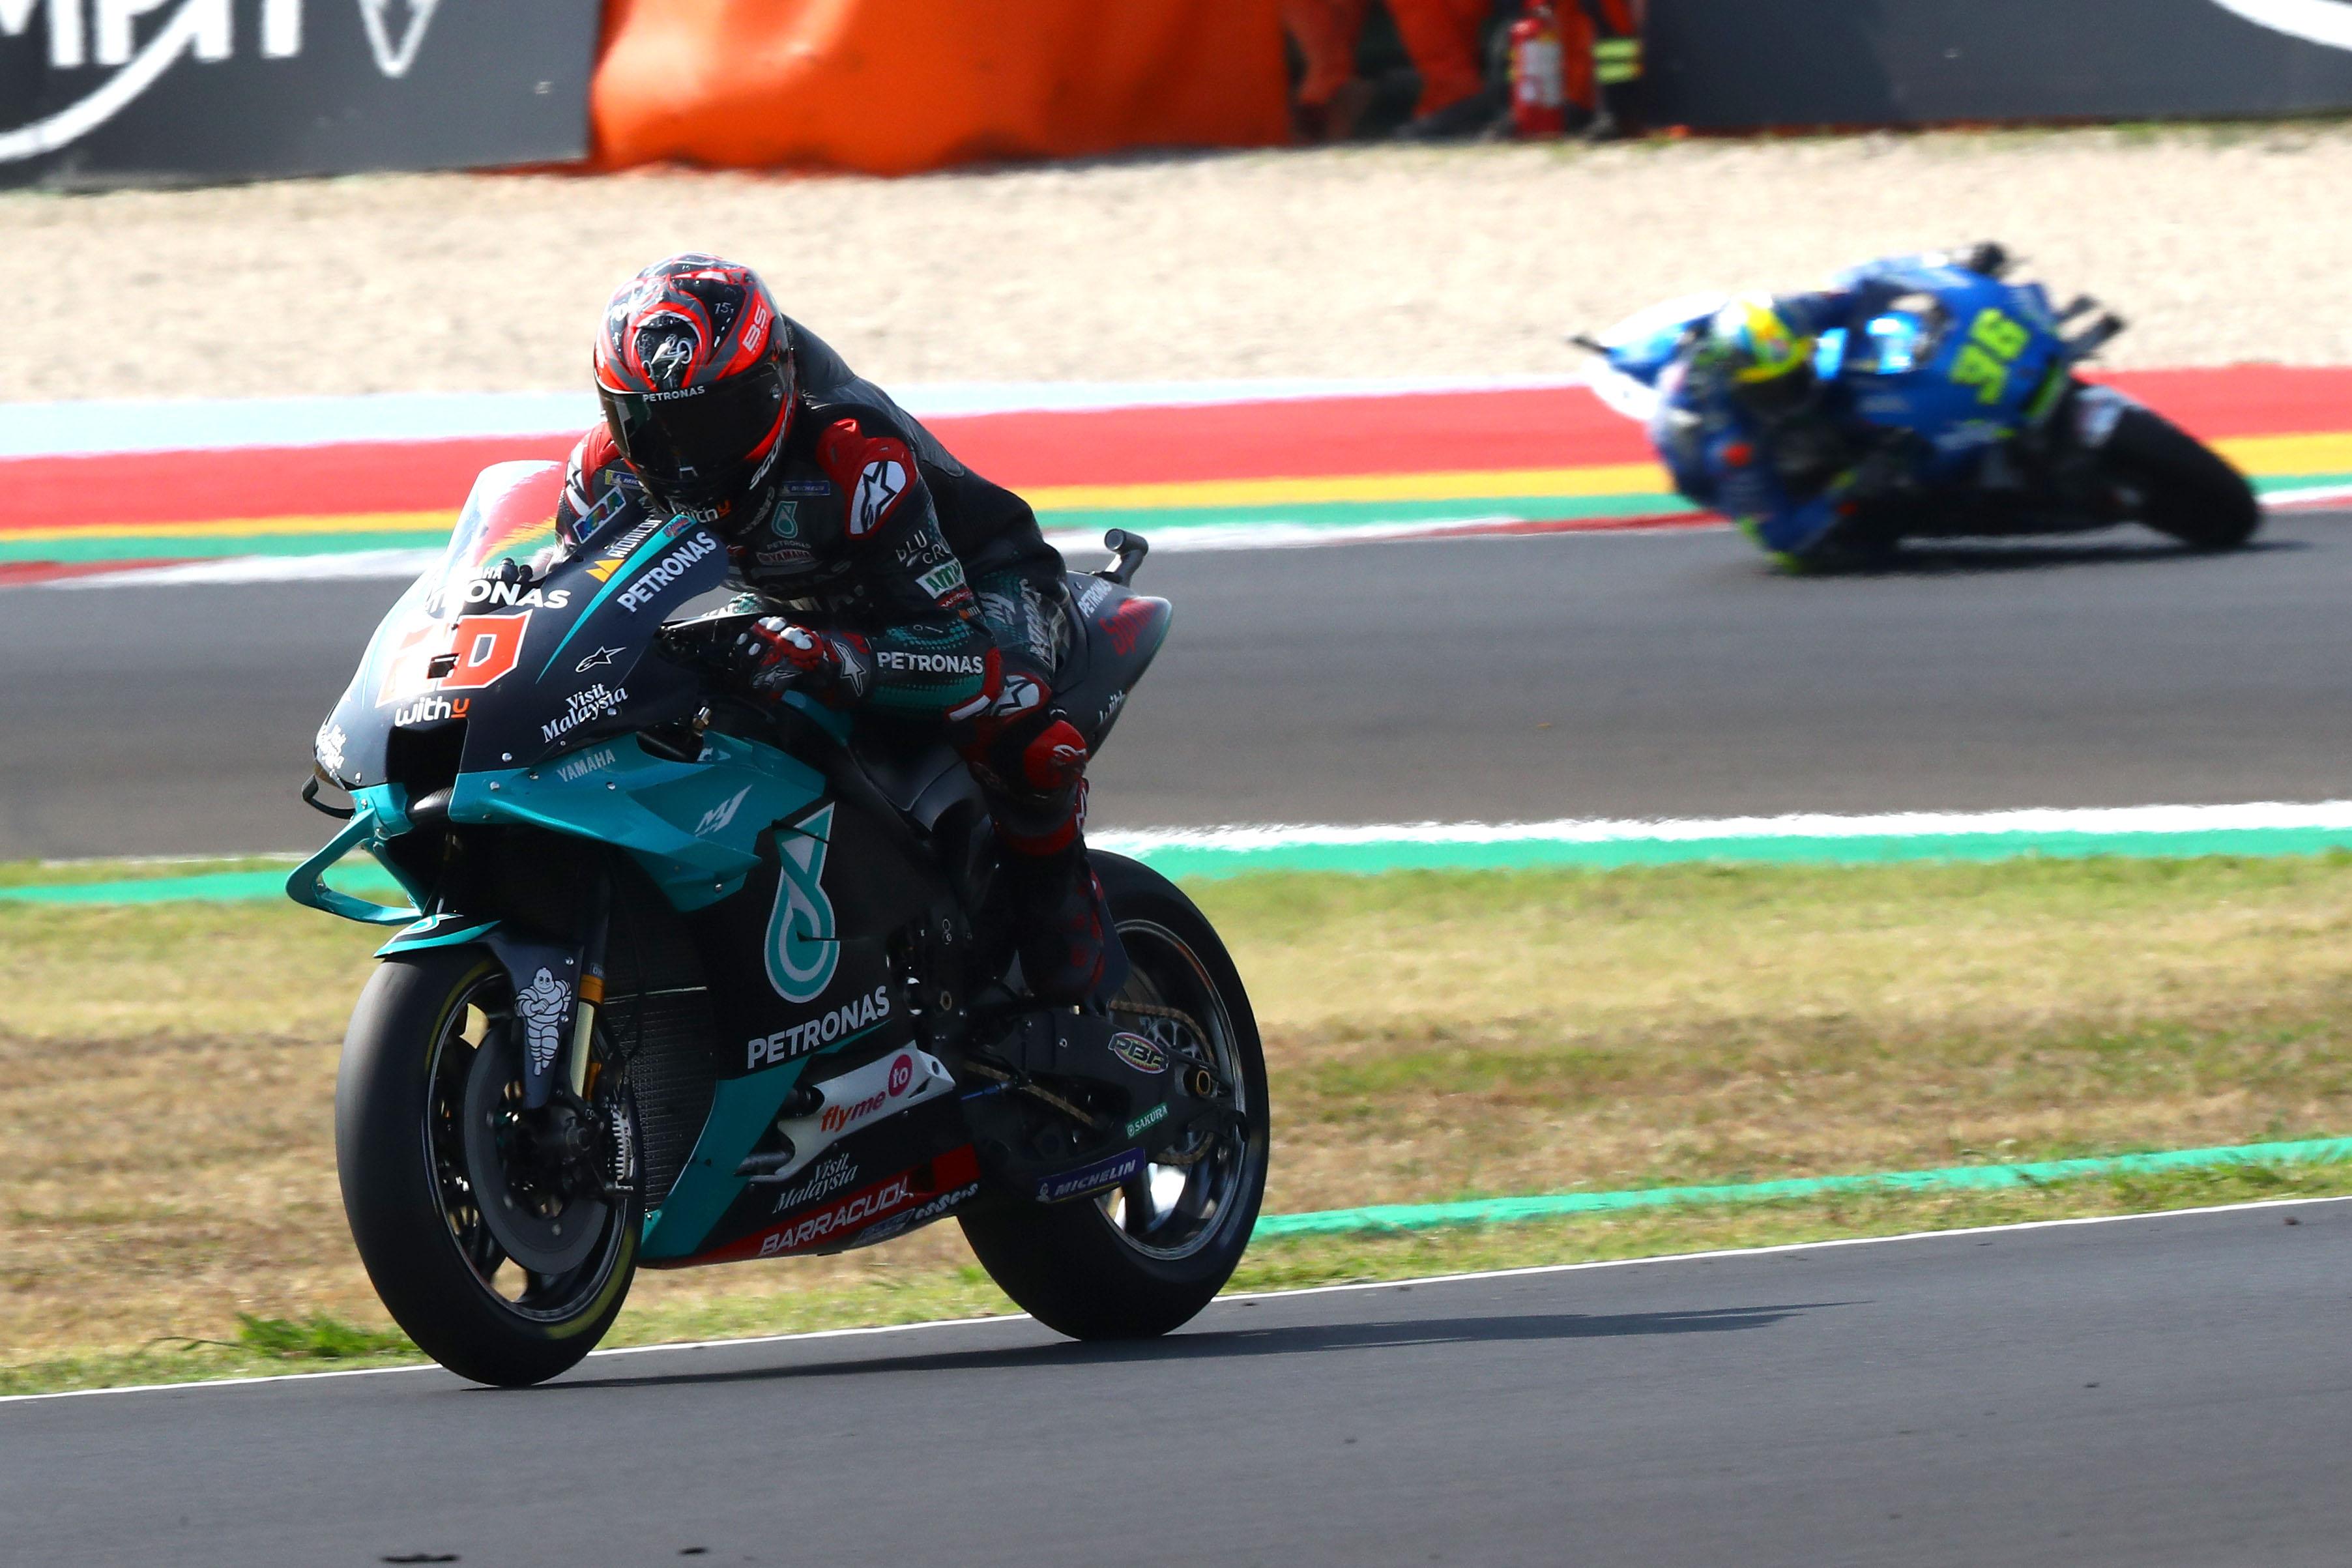 Fabio Quartararo Petronas SRT Yamaha Misano MotoGP 2020